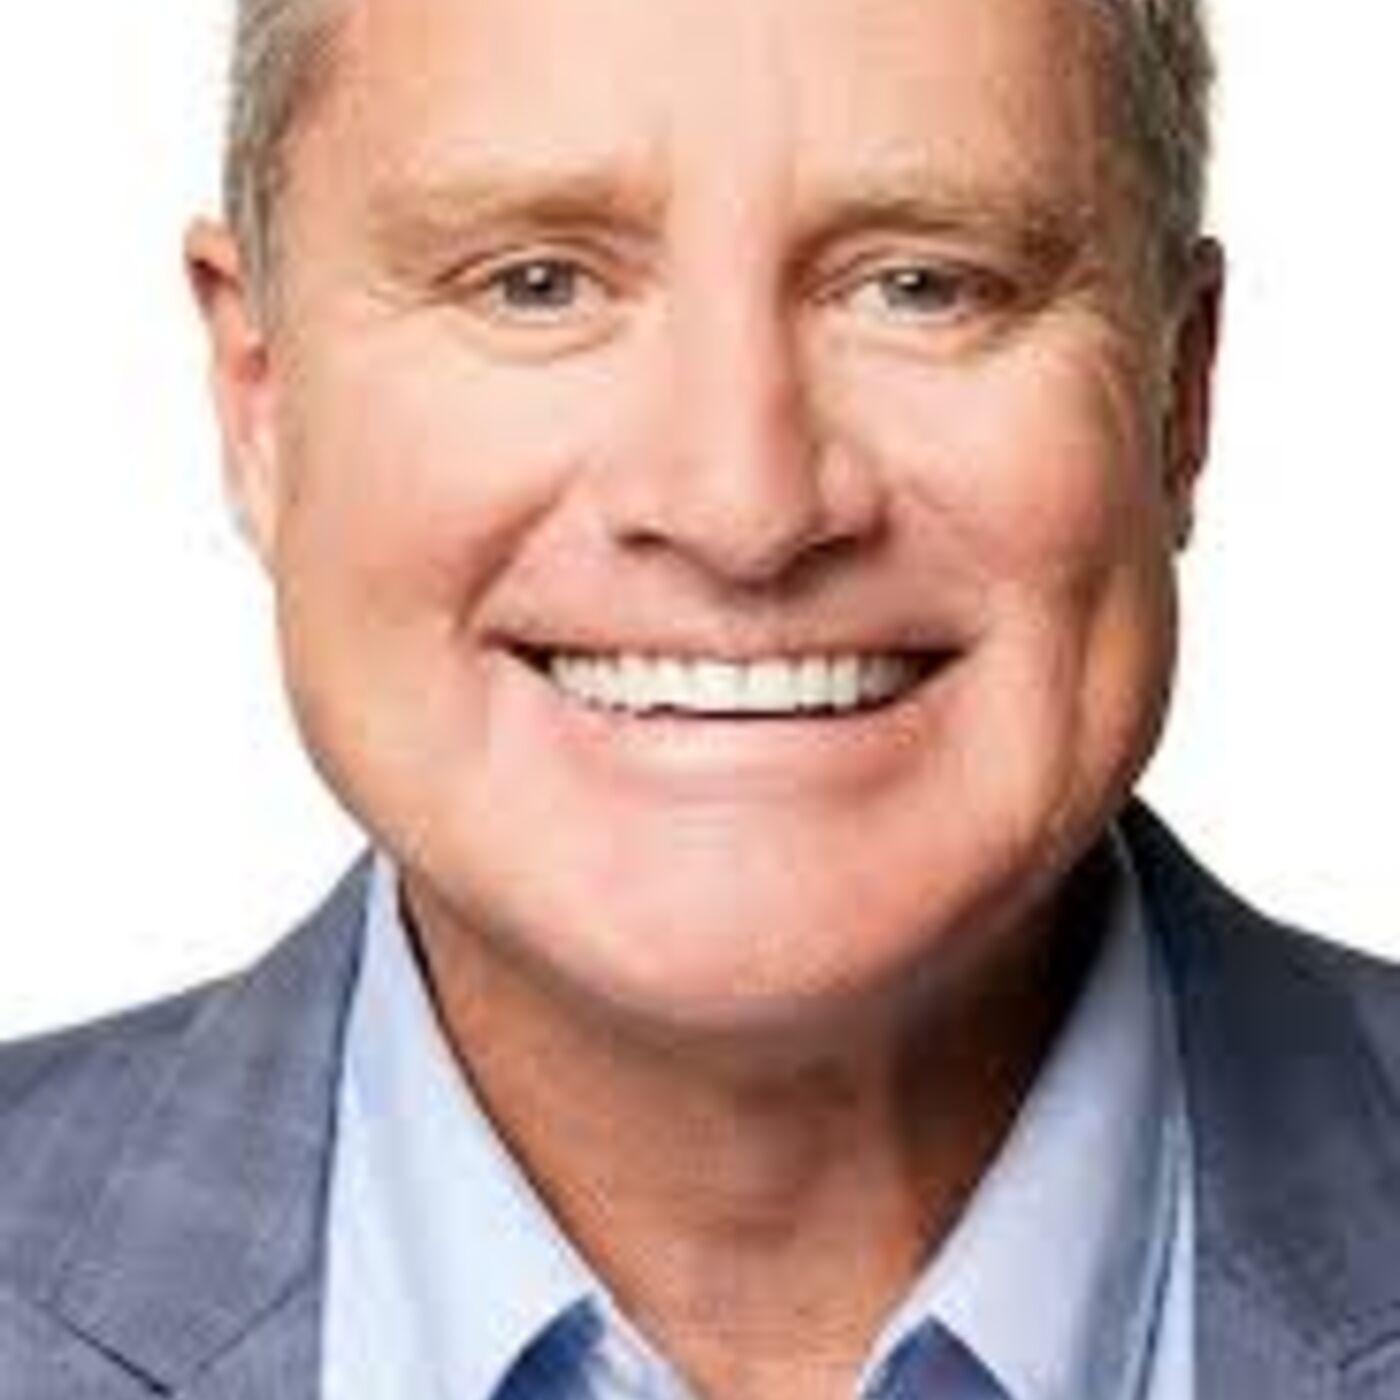 Tim Reid - Host of Australia's #1 business marketing podcast explains how to embrace the modern world of marketing